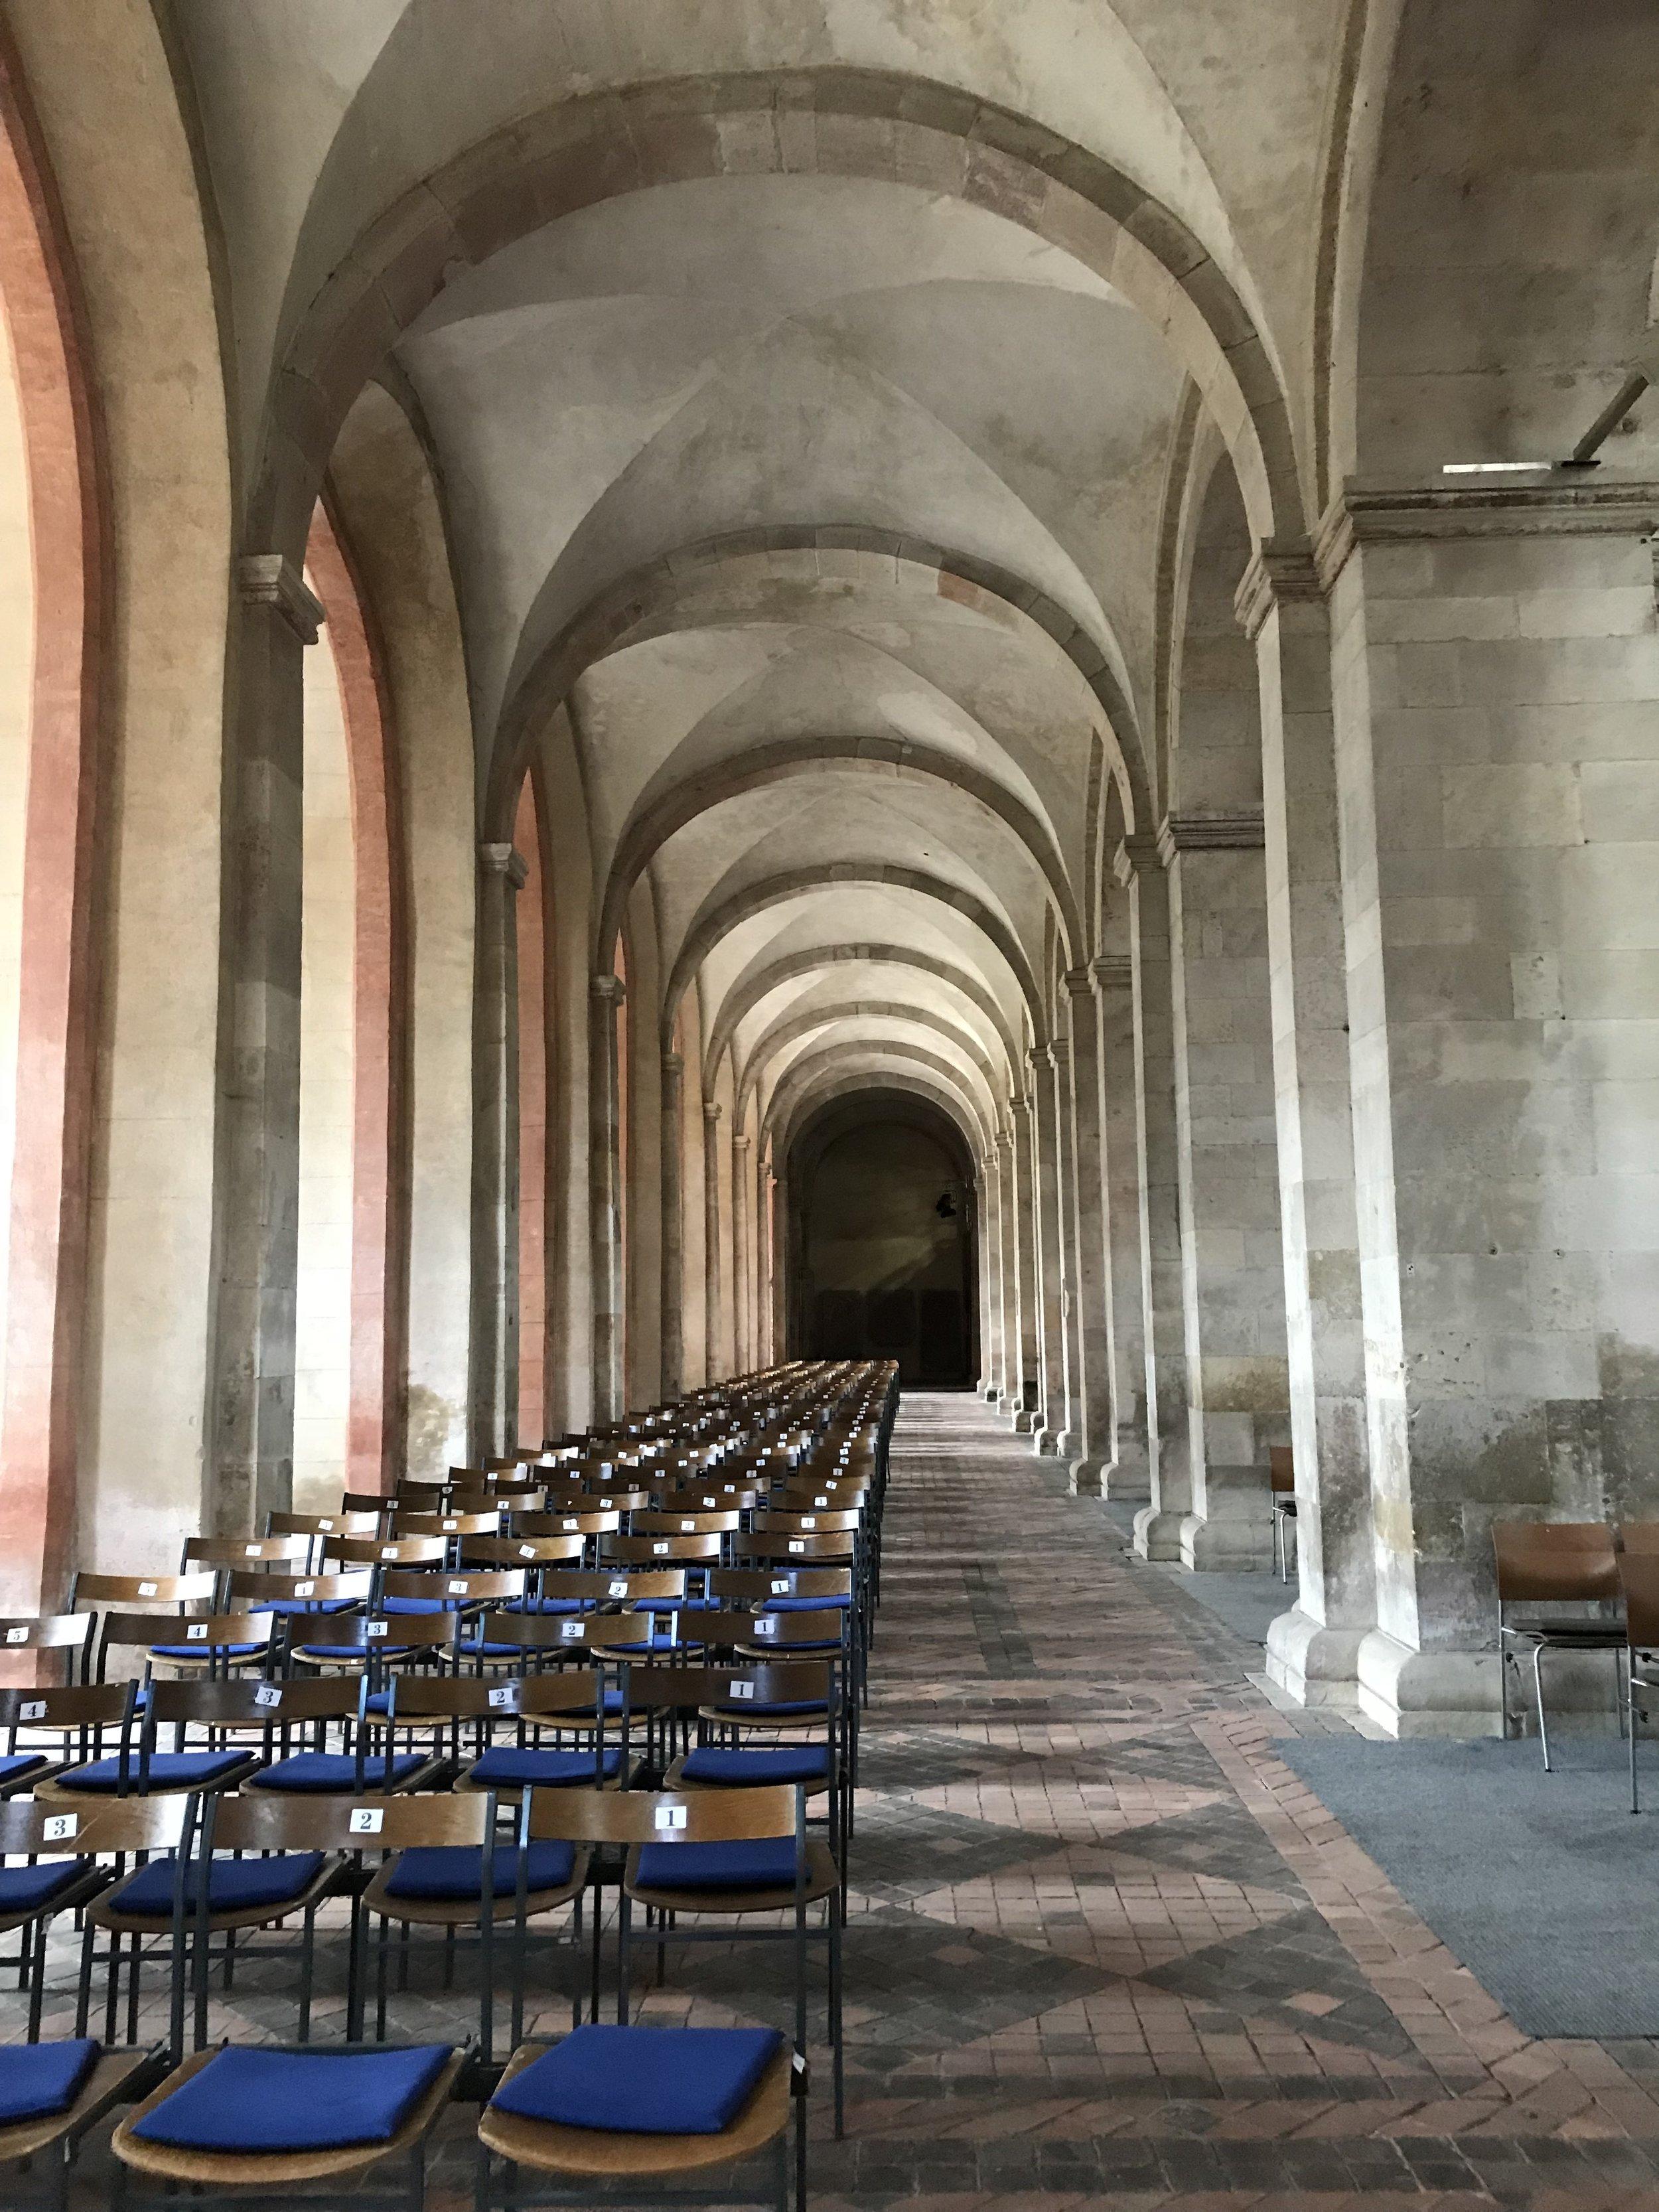 Kloster Eberbach basilica.jpg